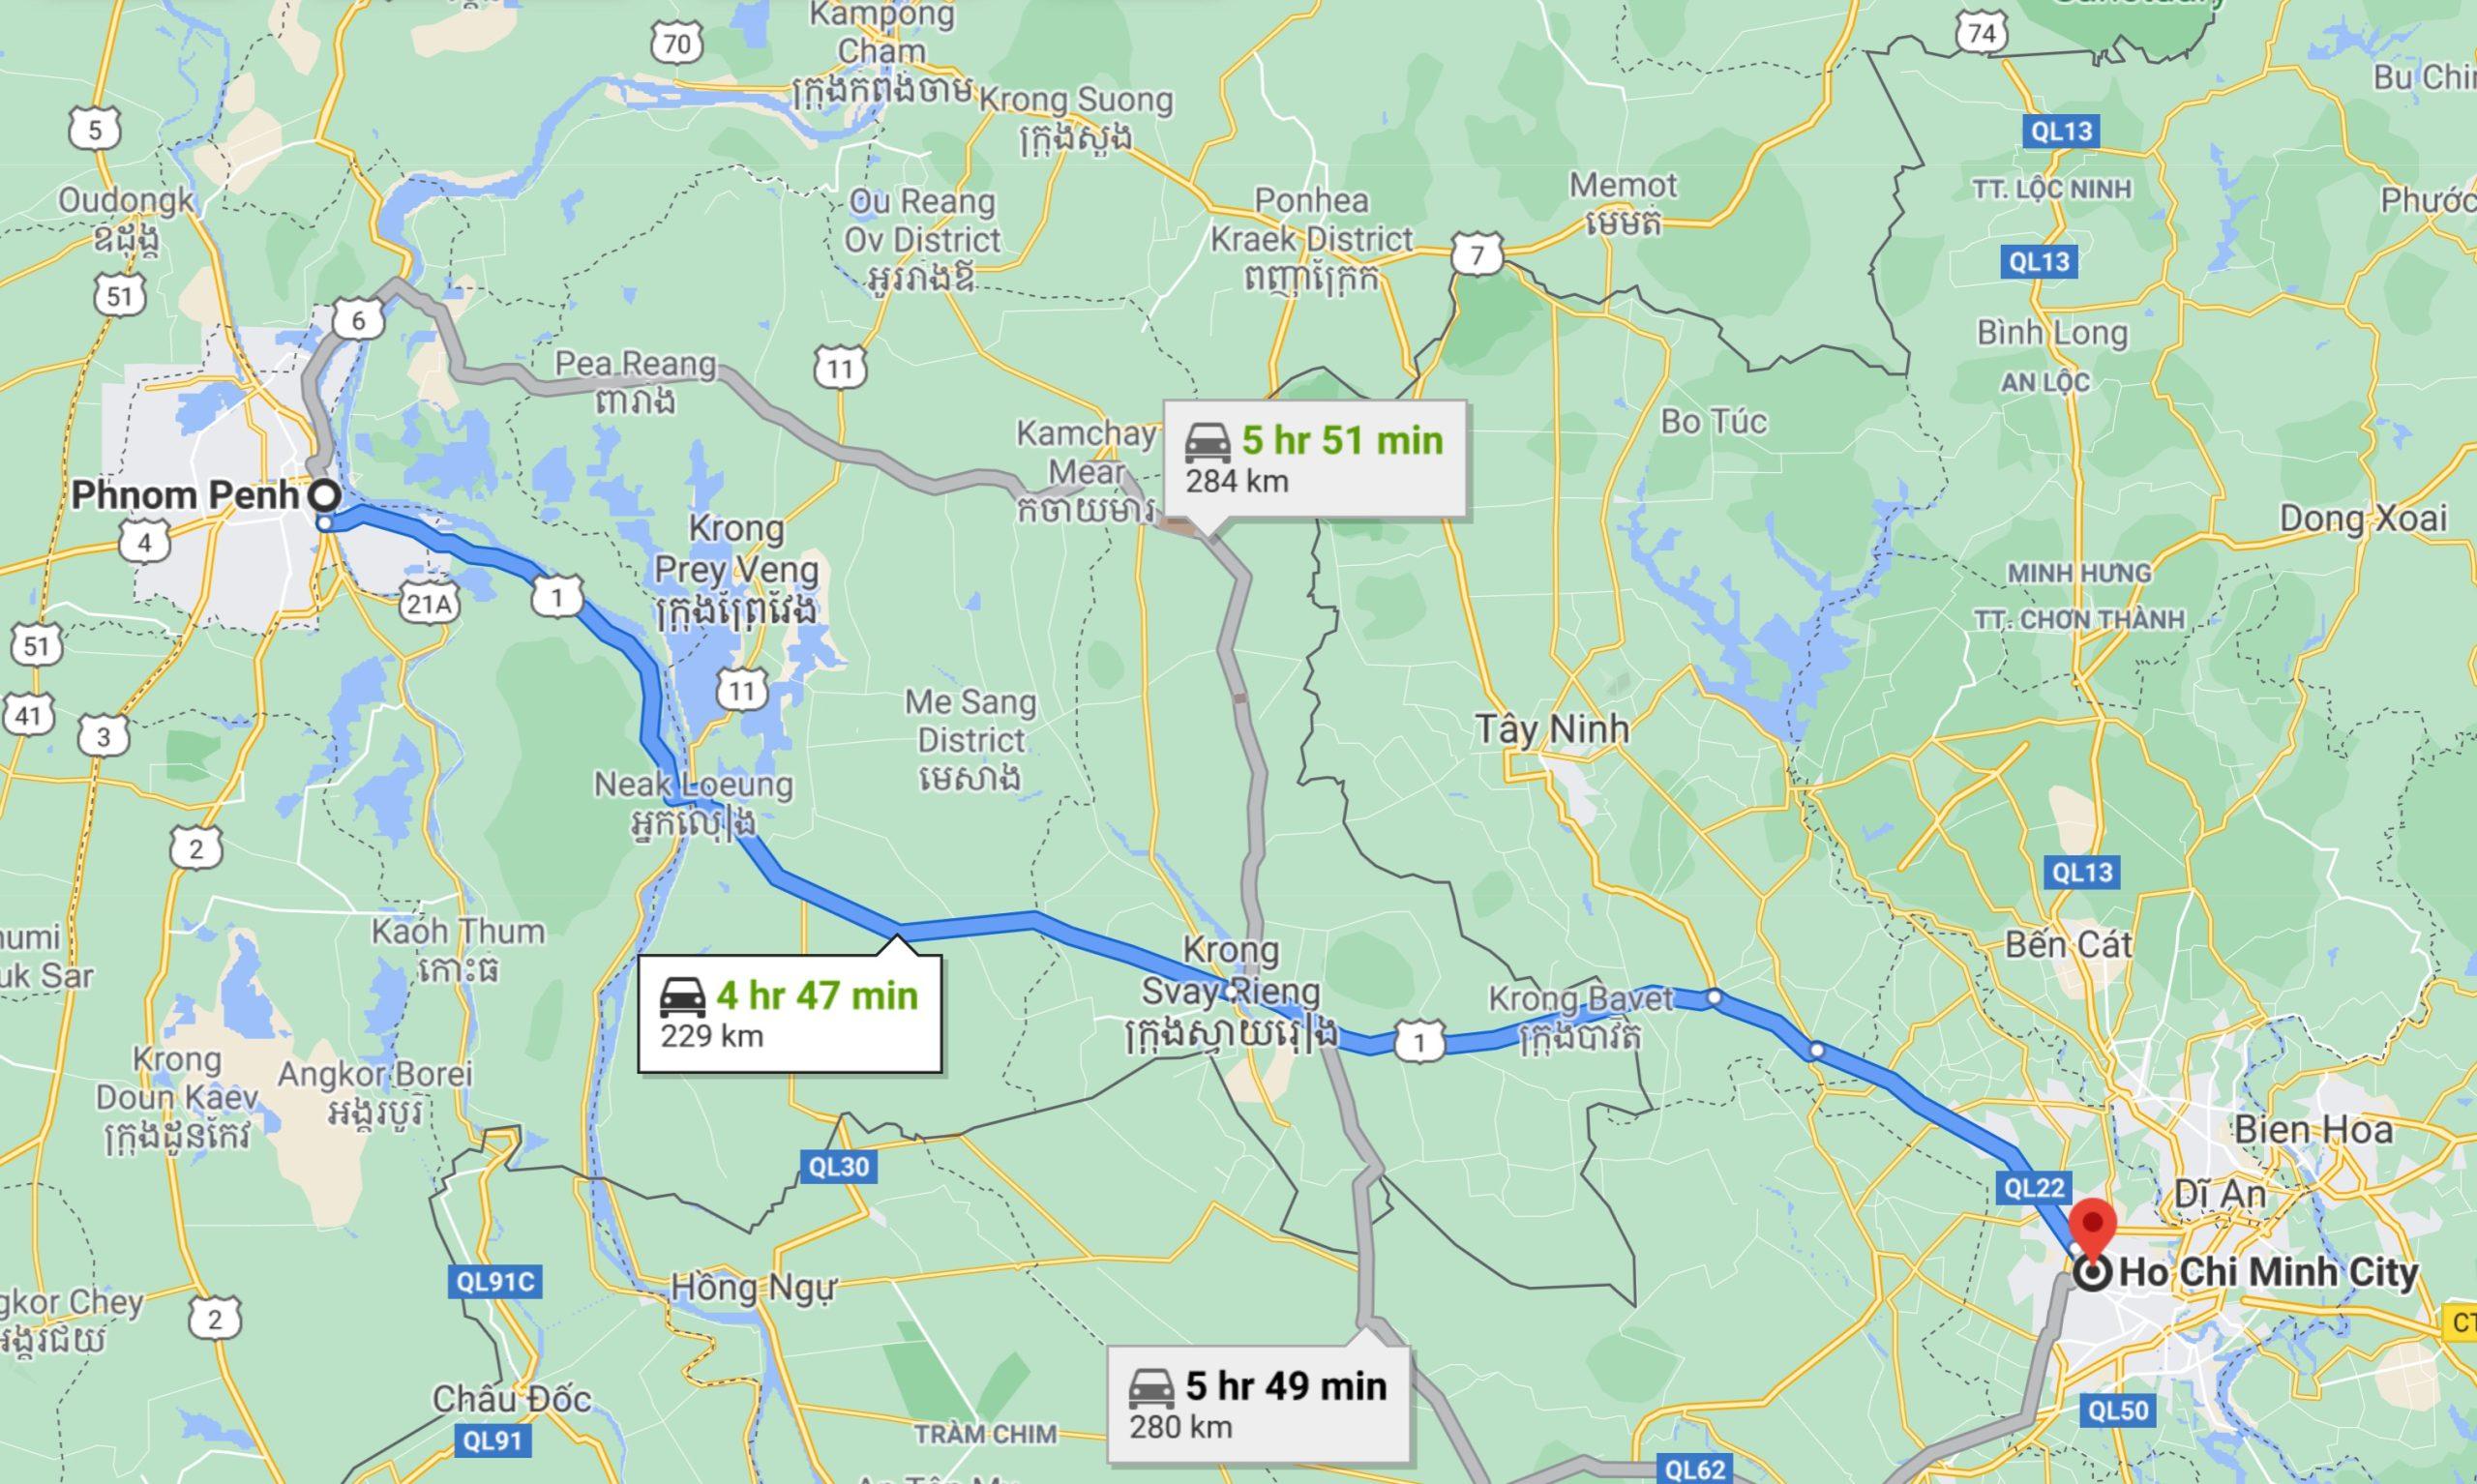 Phnom Penh distance to Ho Chi Minh Vietnam